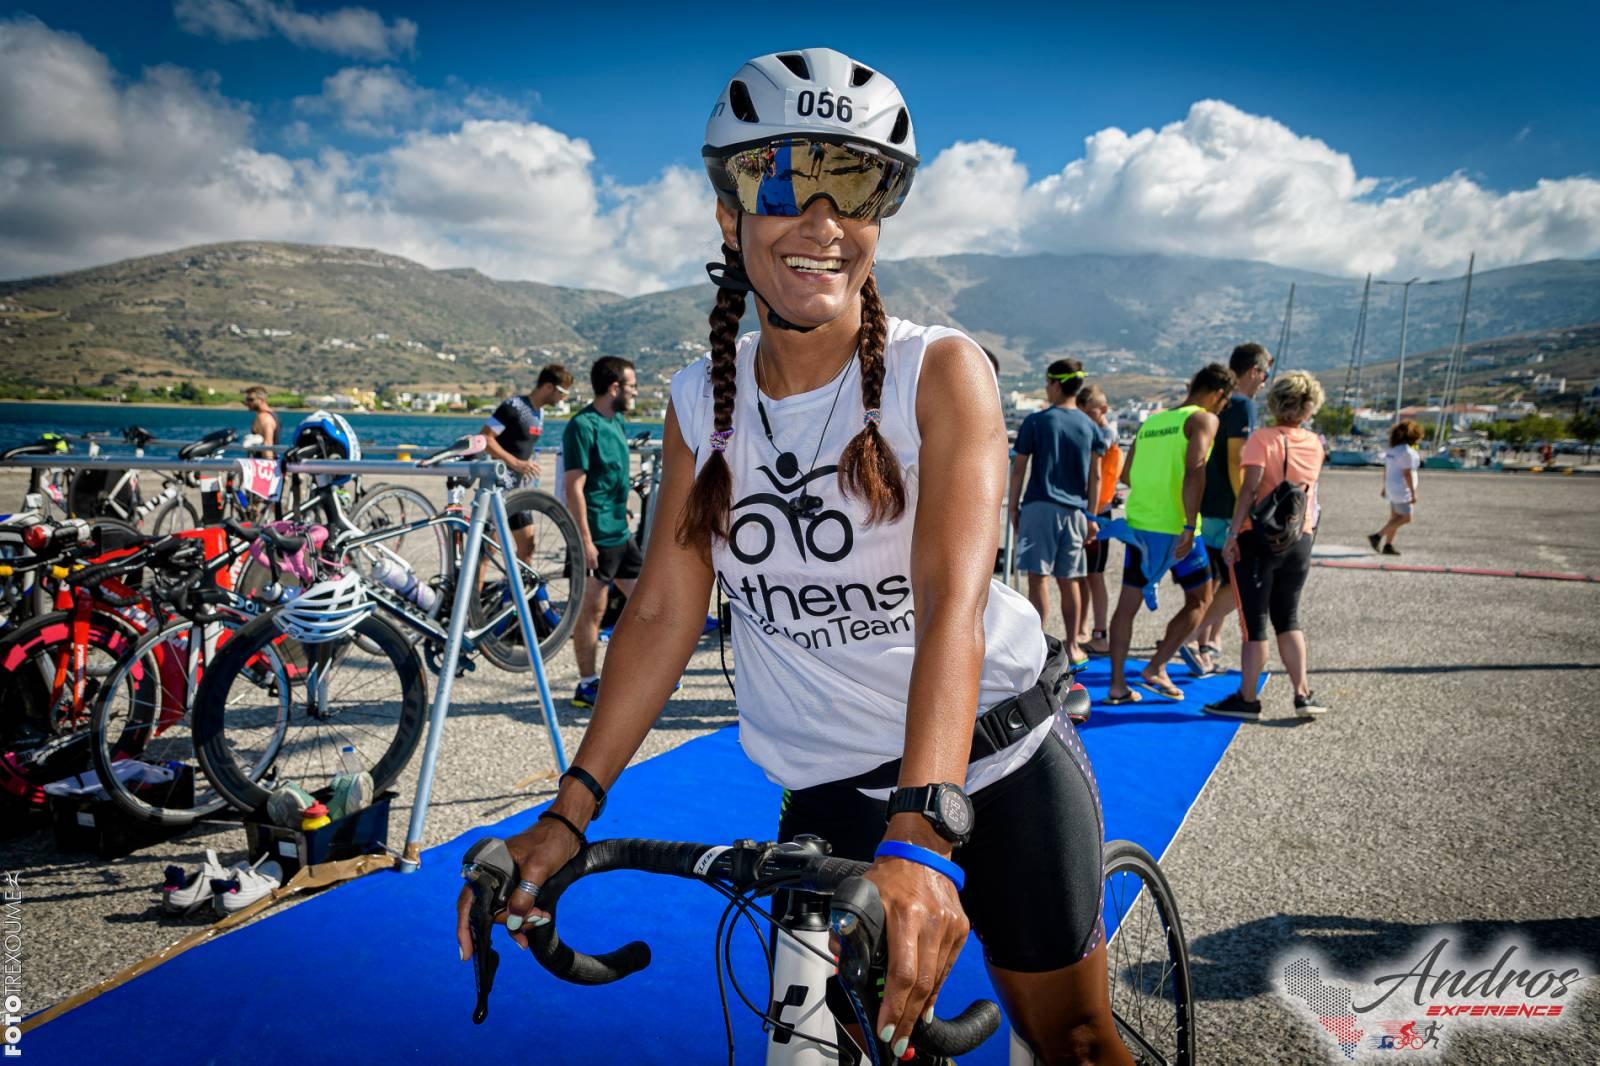 Athens Triathlon Team : Αθηνά Ψευτούδη